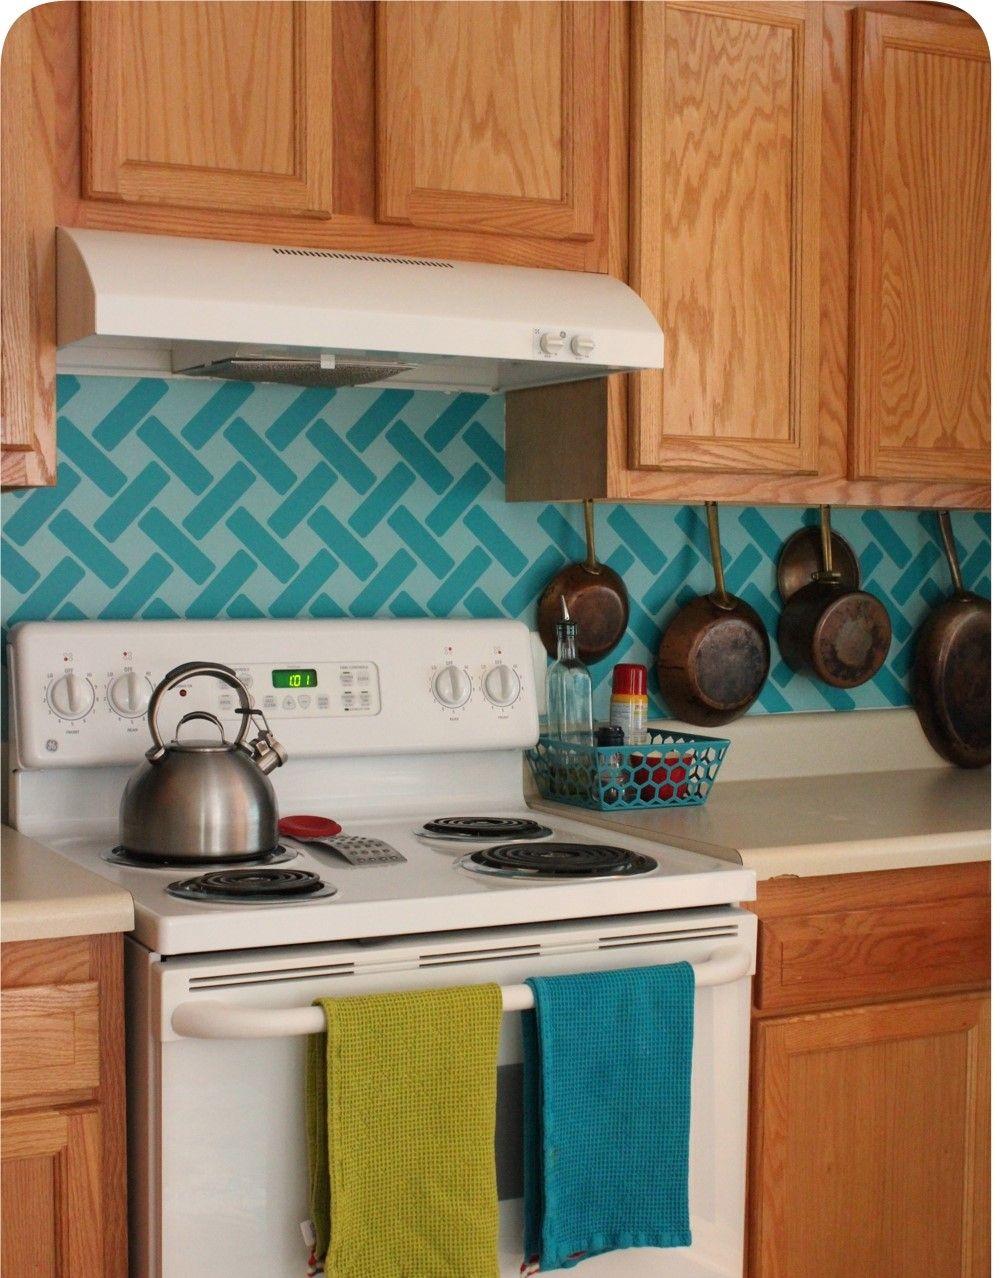 kitchen backsplash stone tile backsplash stacked stone kitchen backsplash on kitchen cabinets vertical lines id=85246